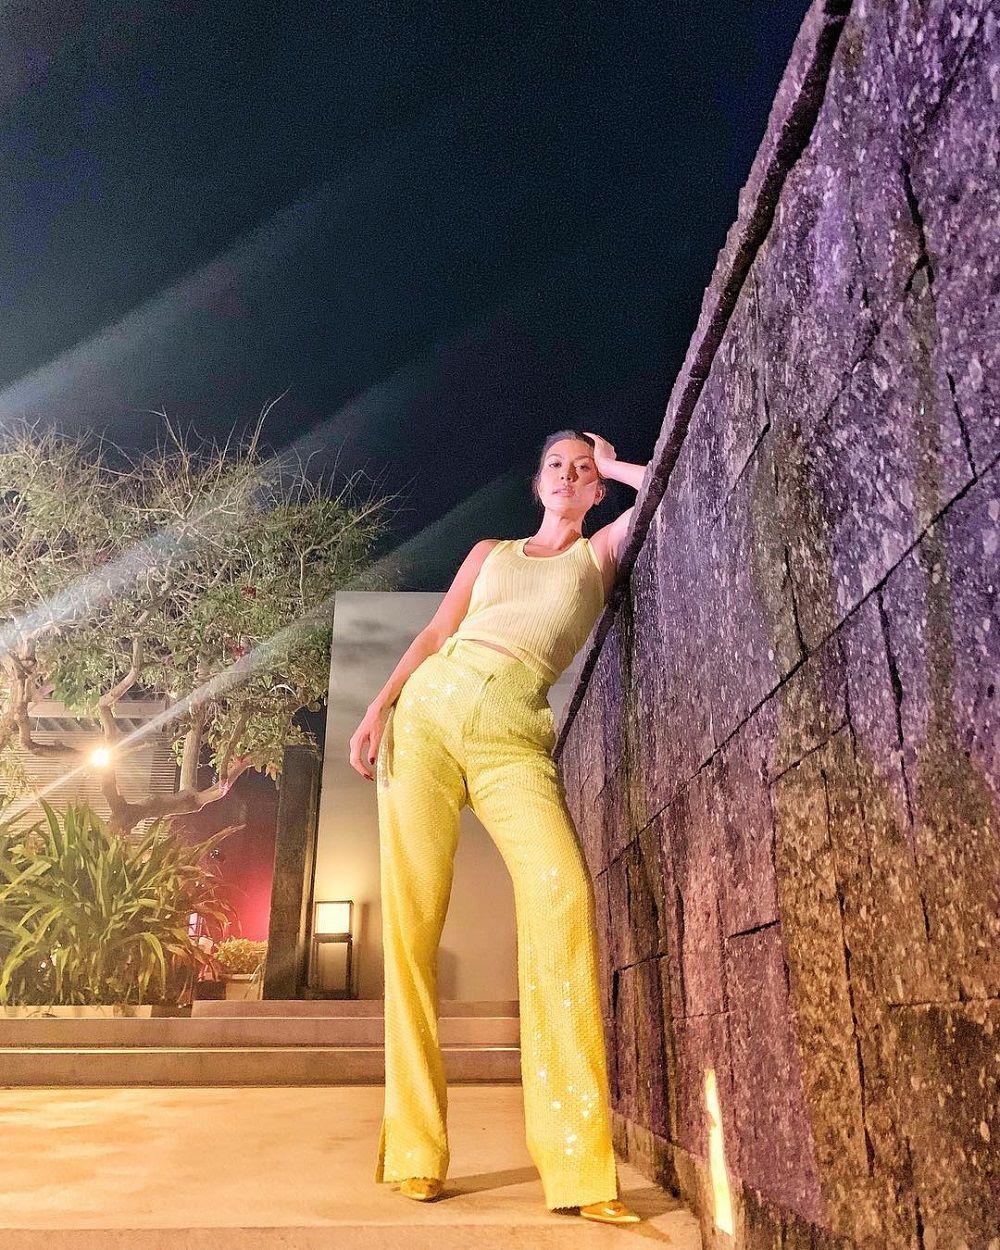 Berlibur ke Bali, Intip Kerennya OOTD Kourtney Kardashian